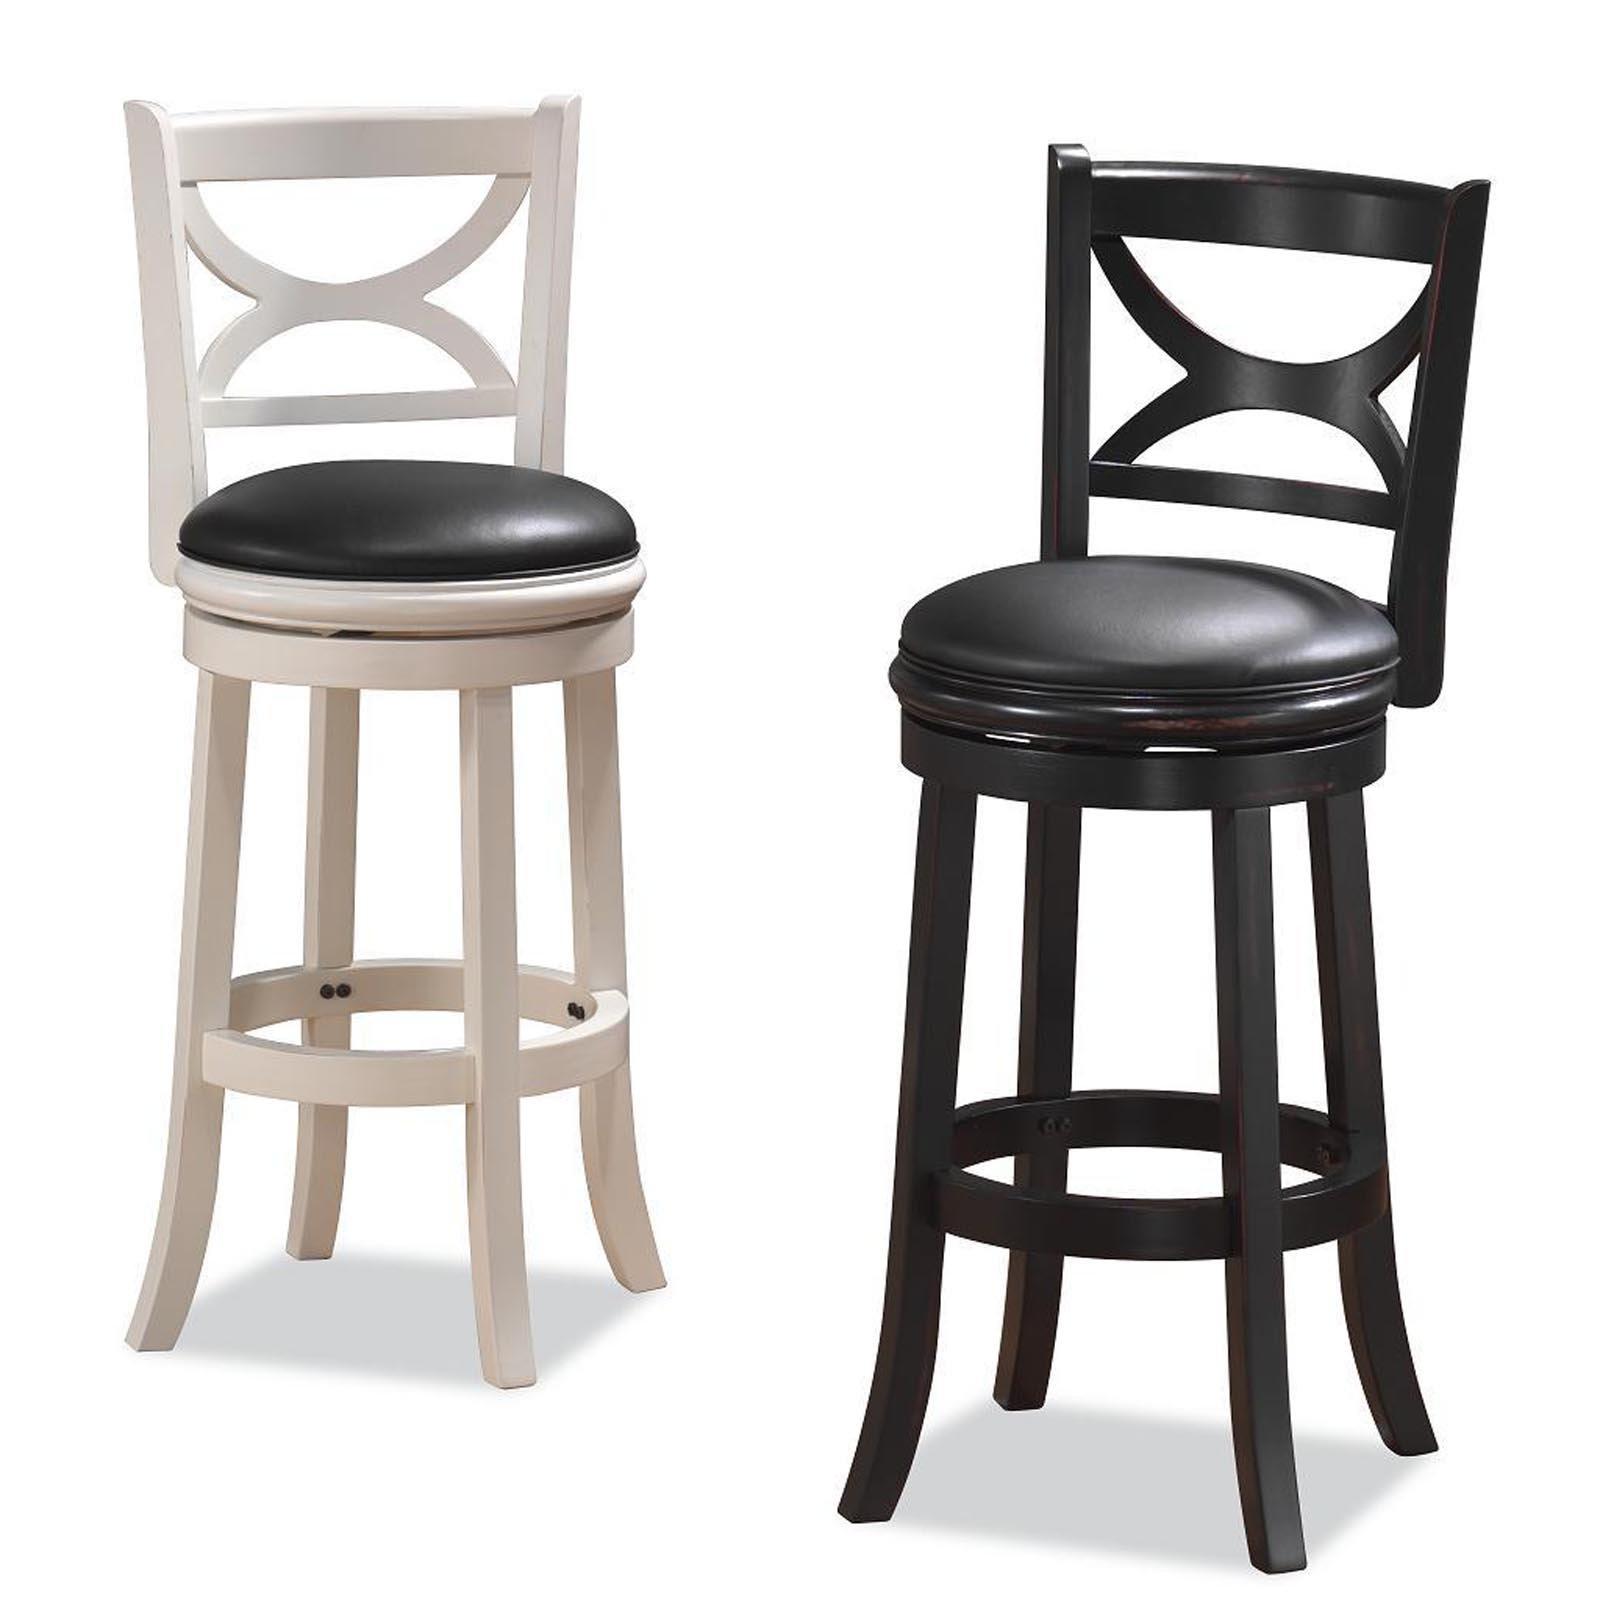 rotating bar stool extra high rotating bar stool |  Hayneedle YANJNEV